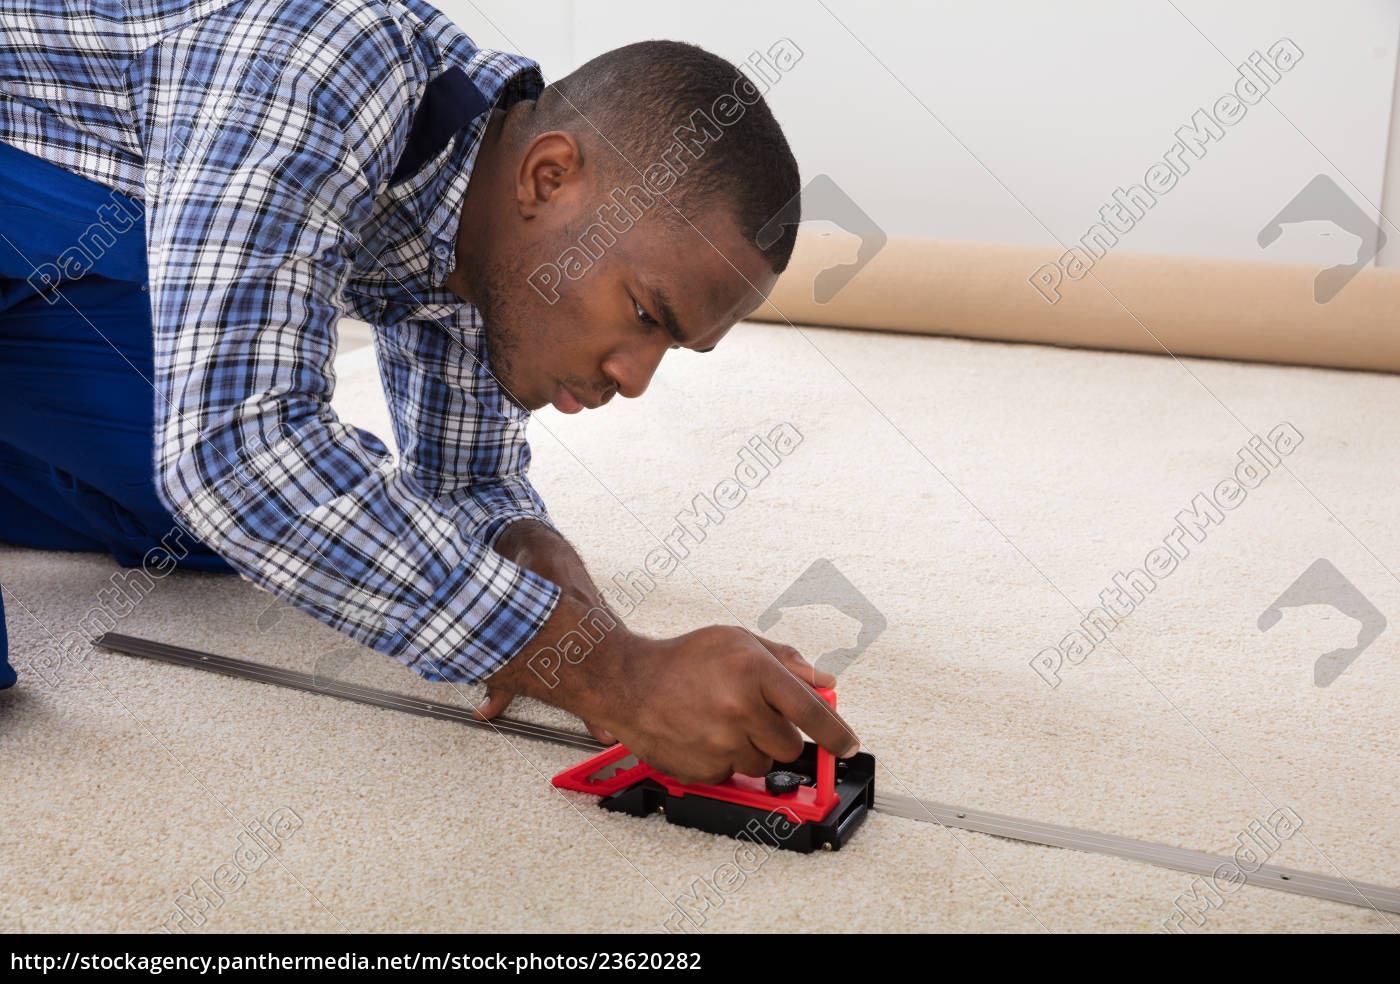 craftsman, installing, carpet, on, floor - 23620282